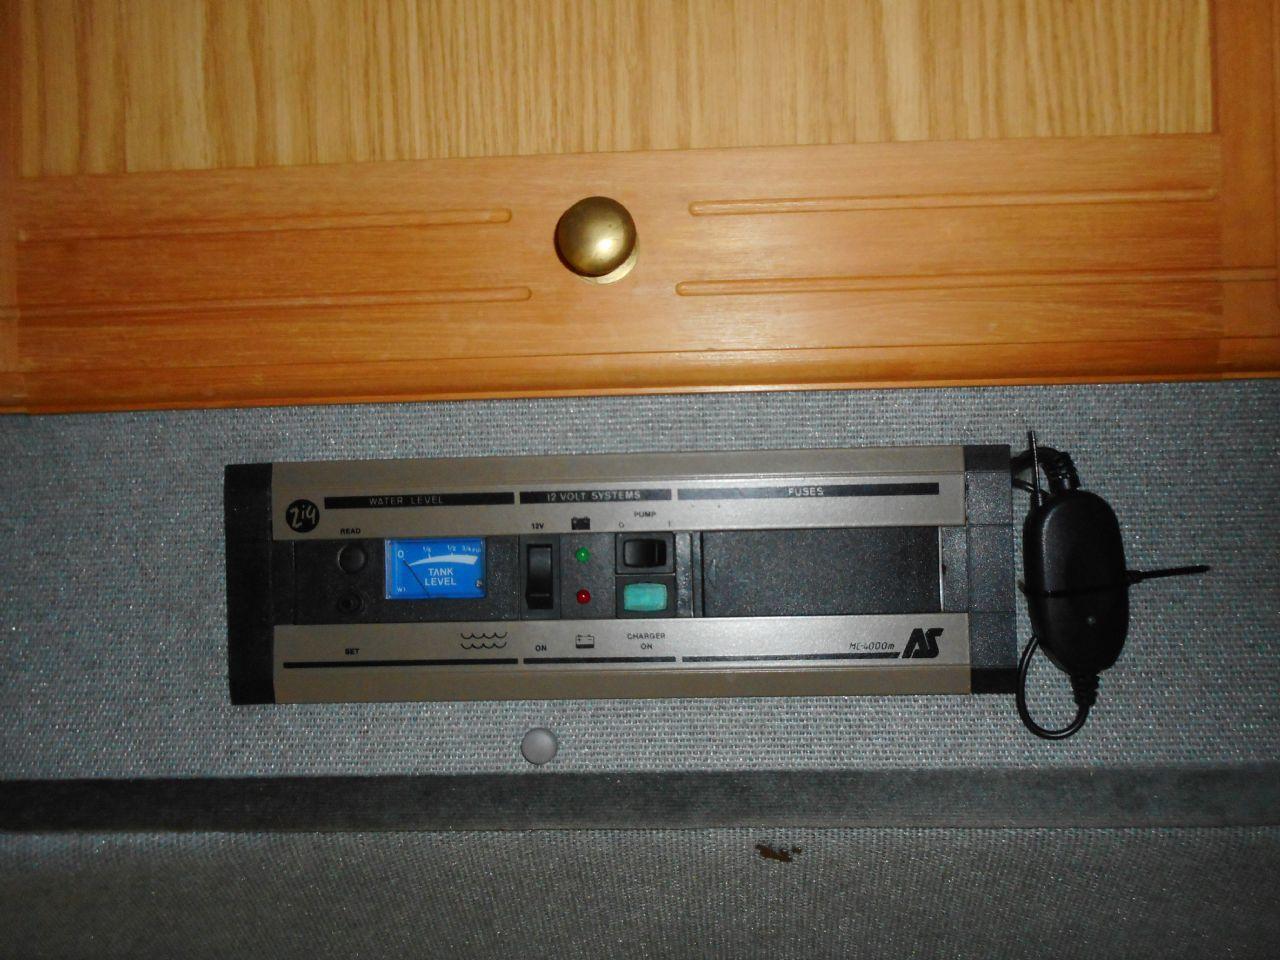 PEUGEOT BOXER 320 MWB CAMPER VAN  (1995) - Picture 18